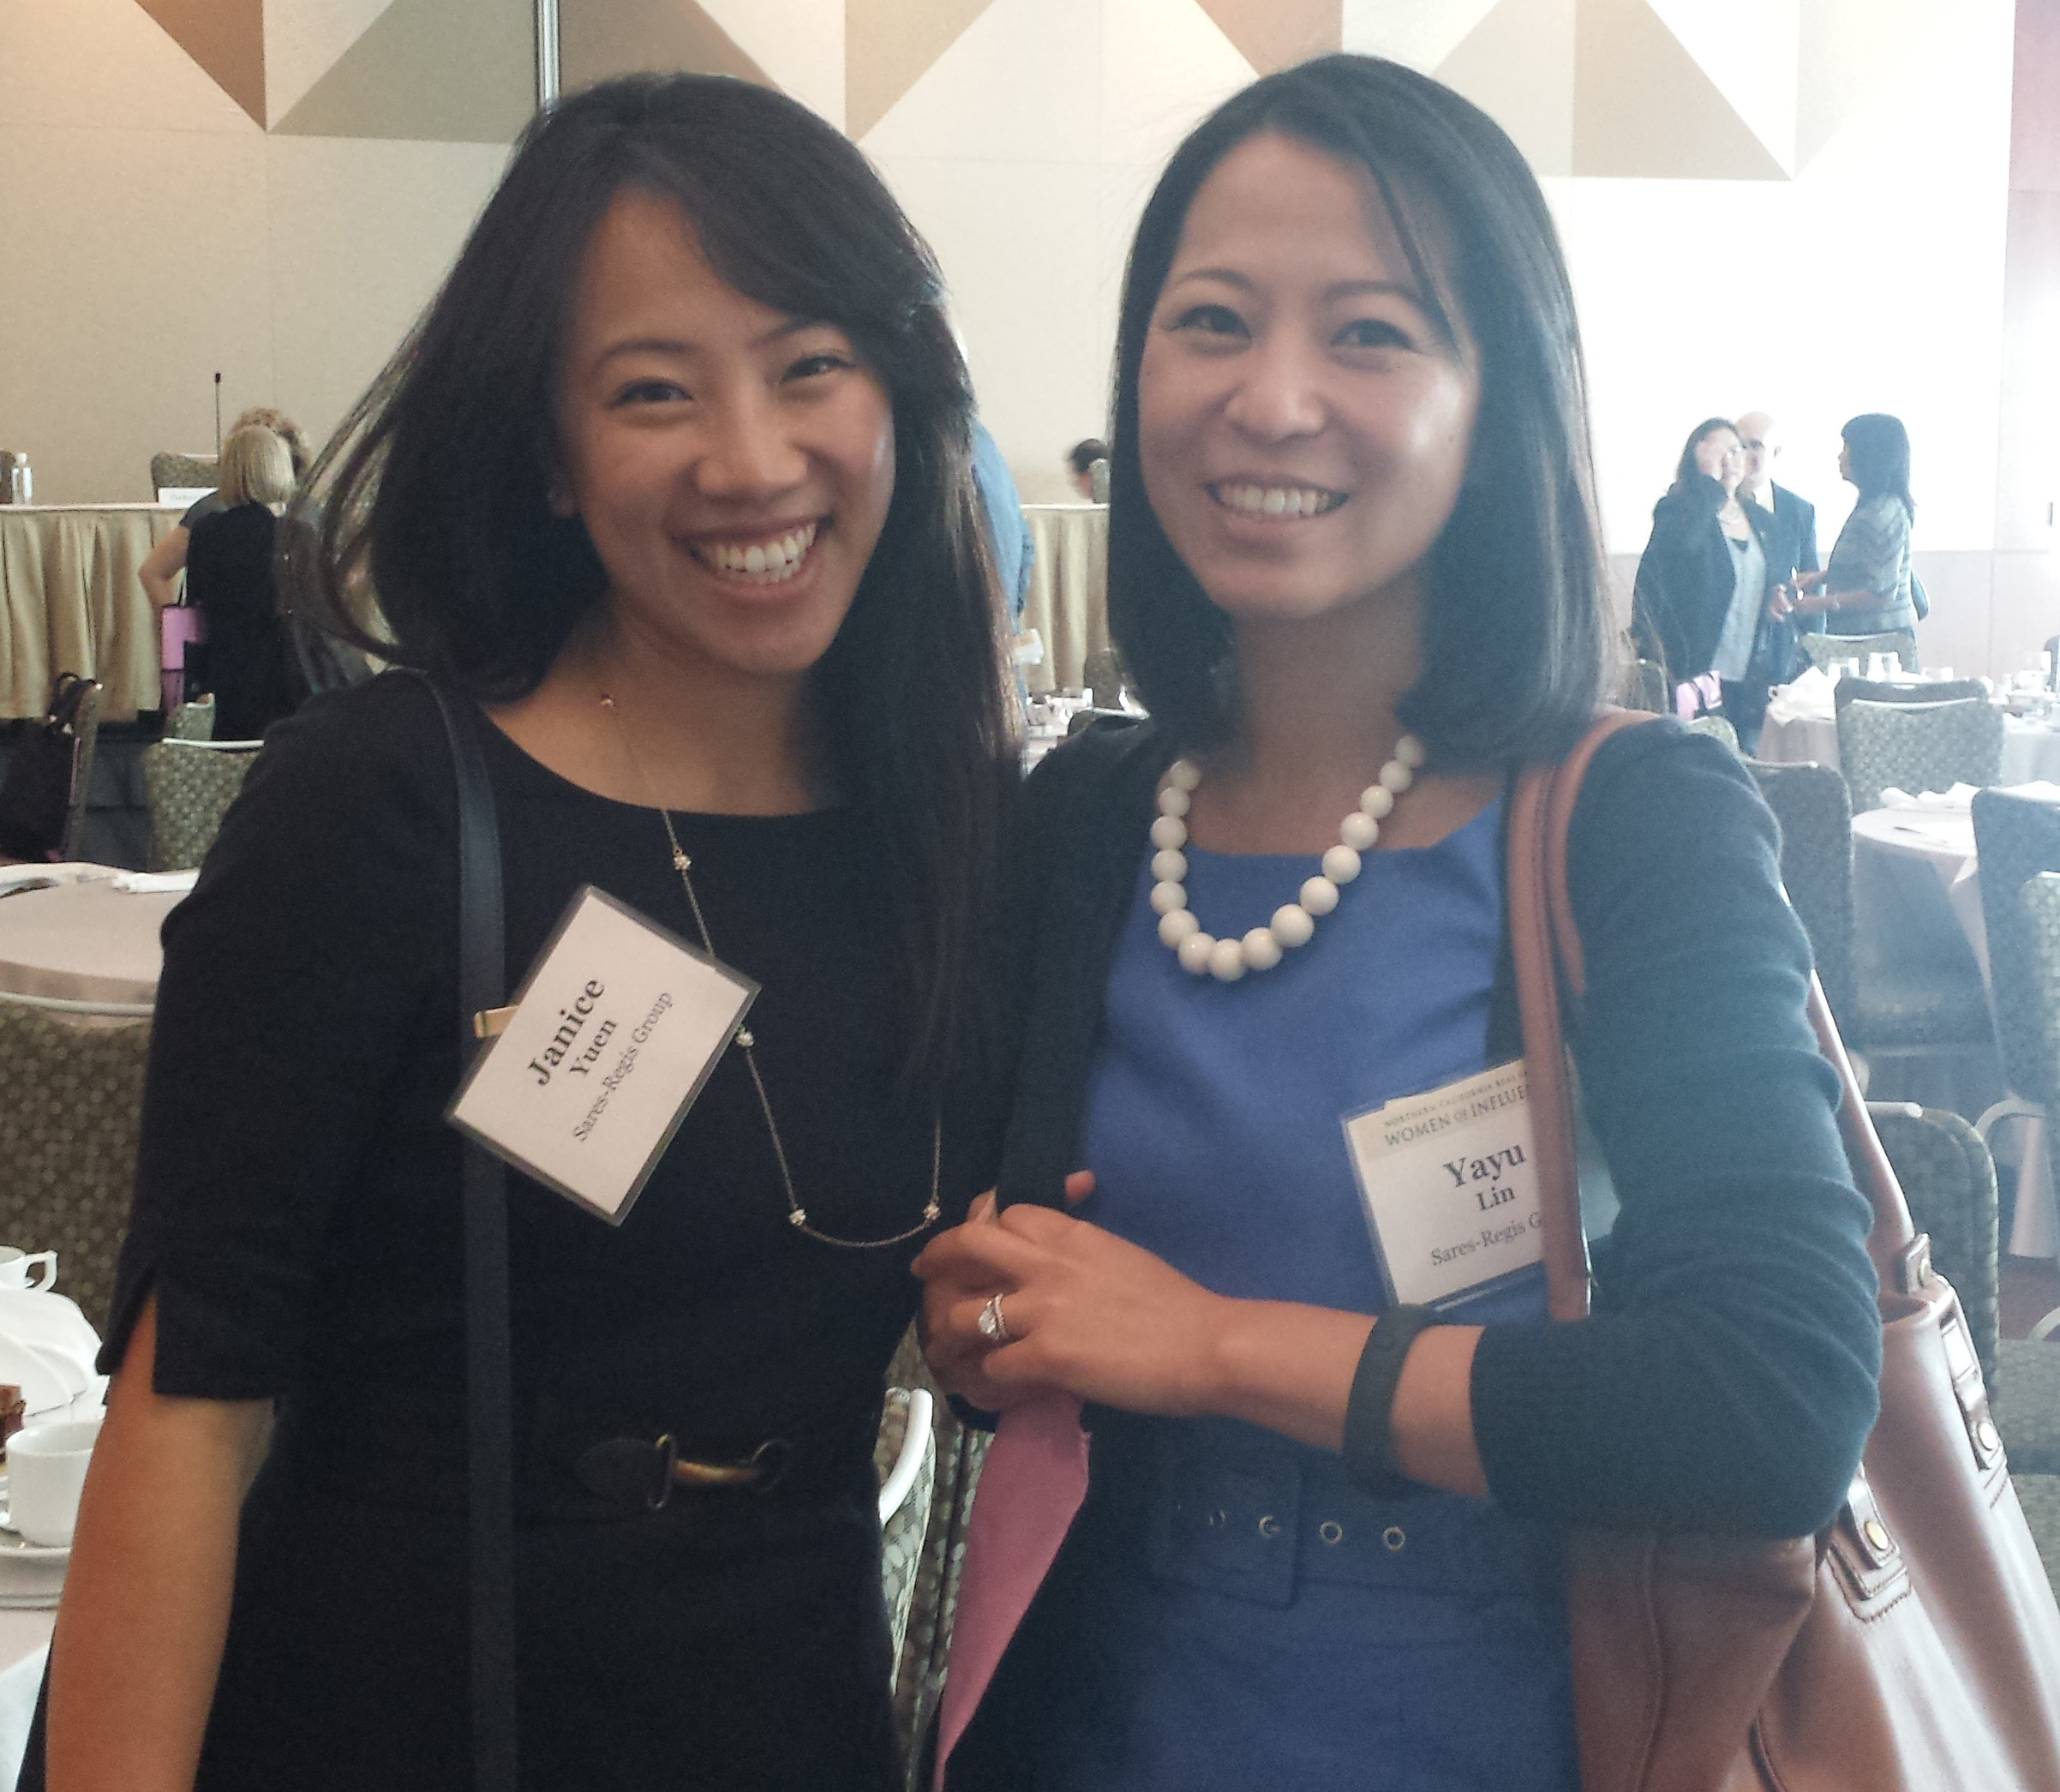 image of Janice Yuen and Yayu Lin.